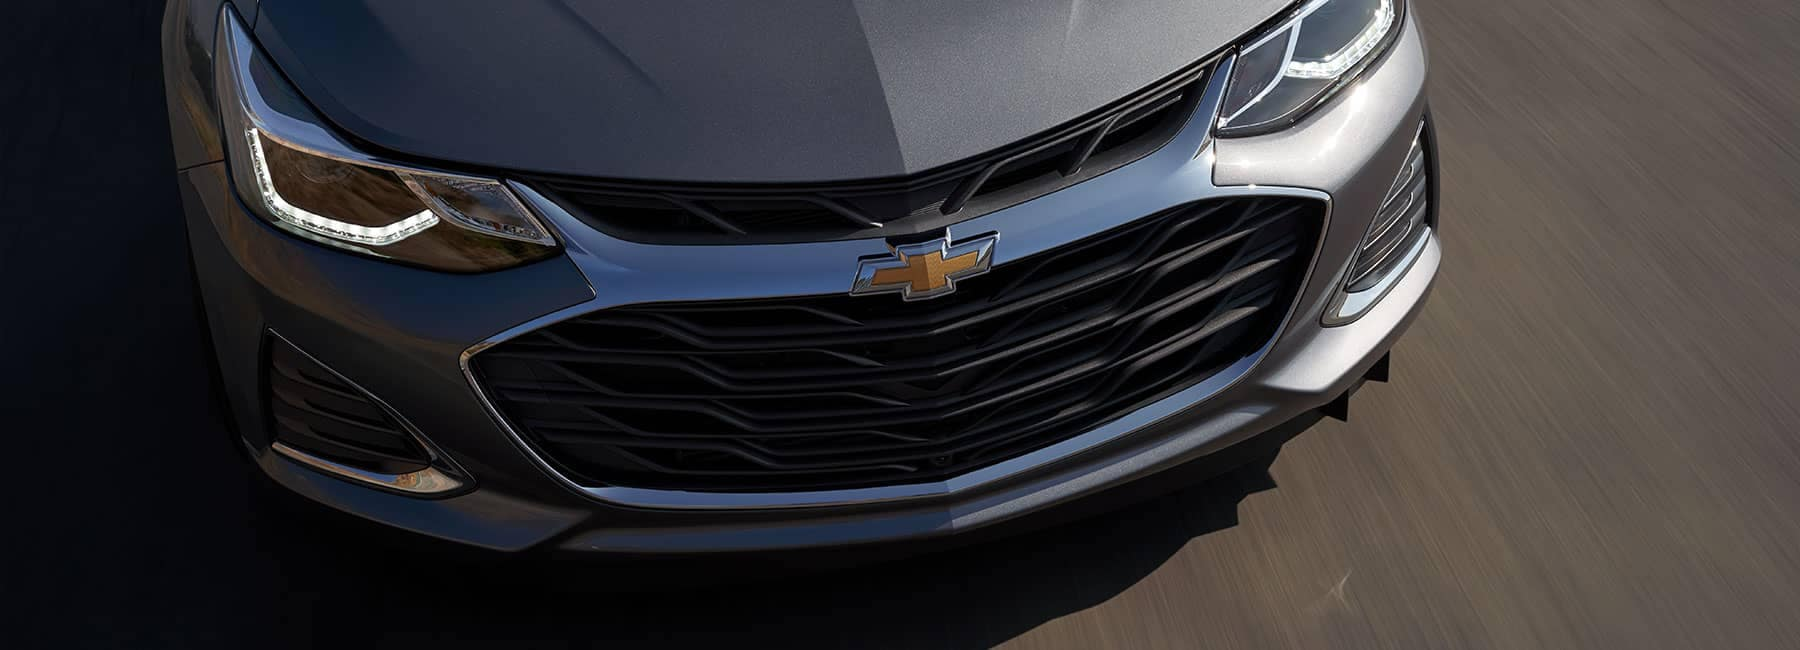 2019 Chevrolet front detail